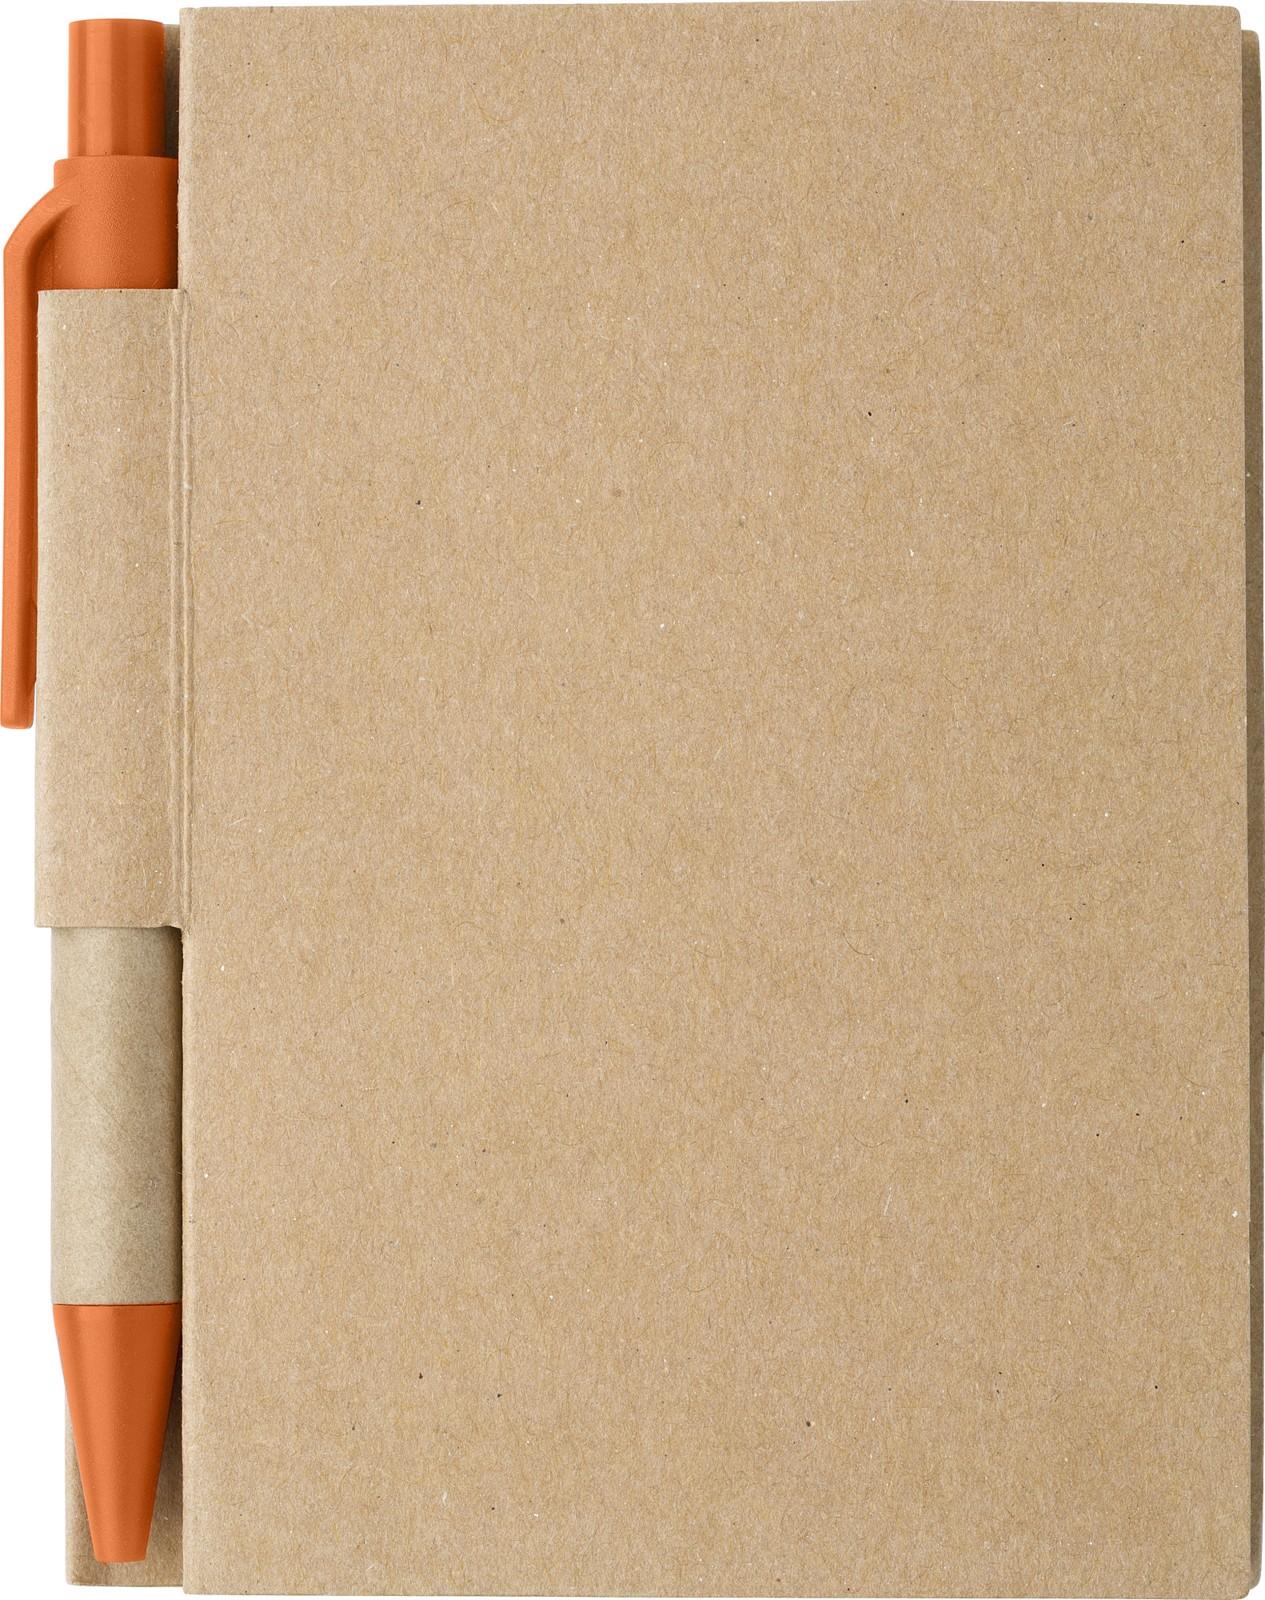 Paper notebook - Orange